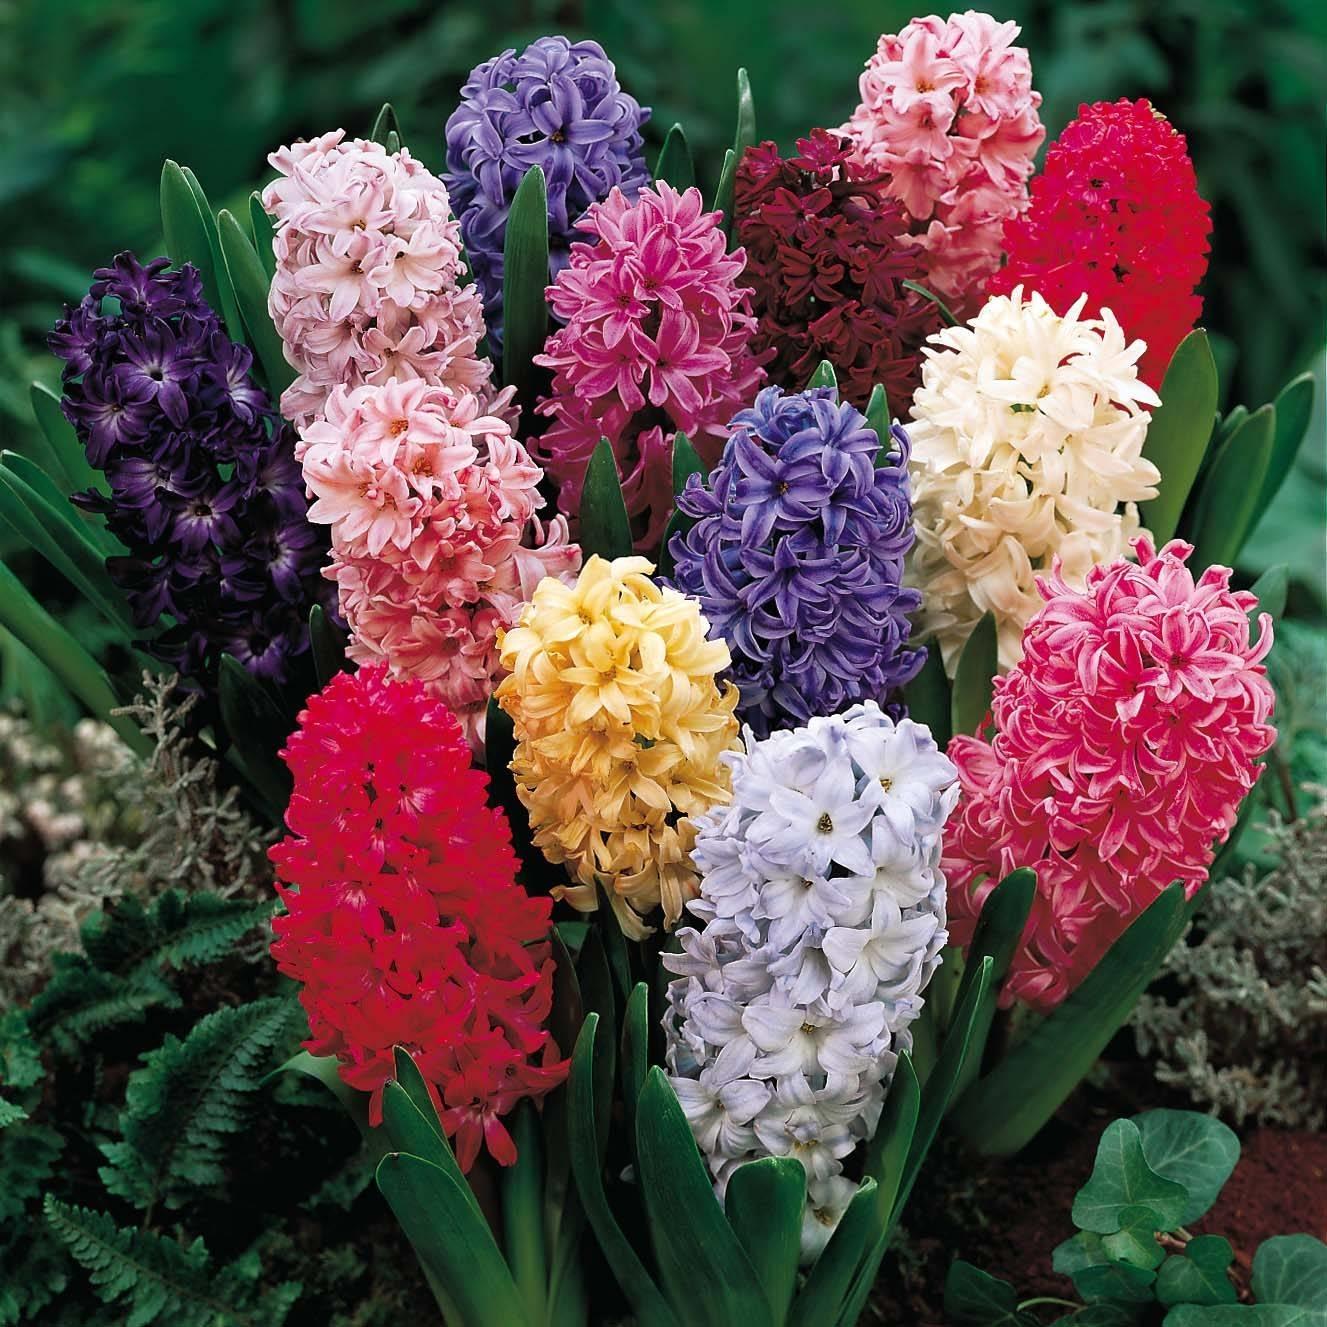 Giacinto, hyacinthus, coltura ad acqua, linguaggio dei fiori